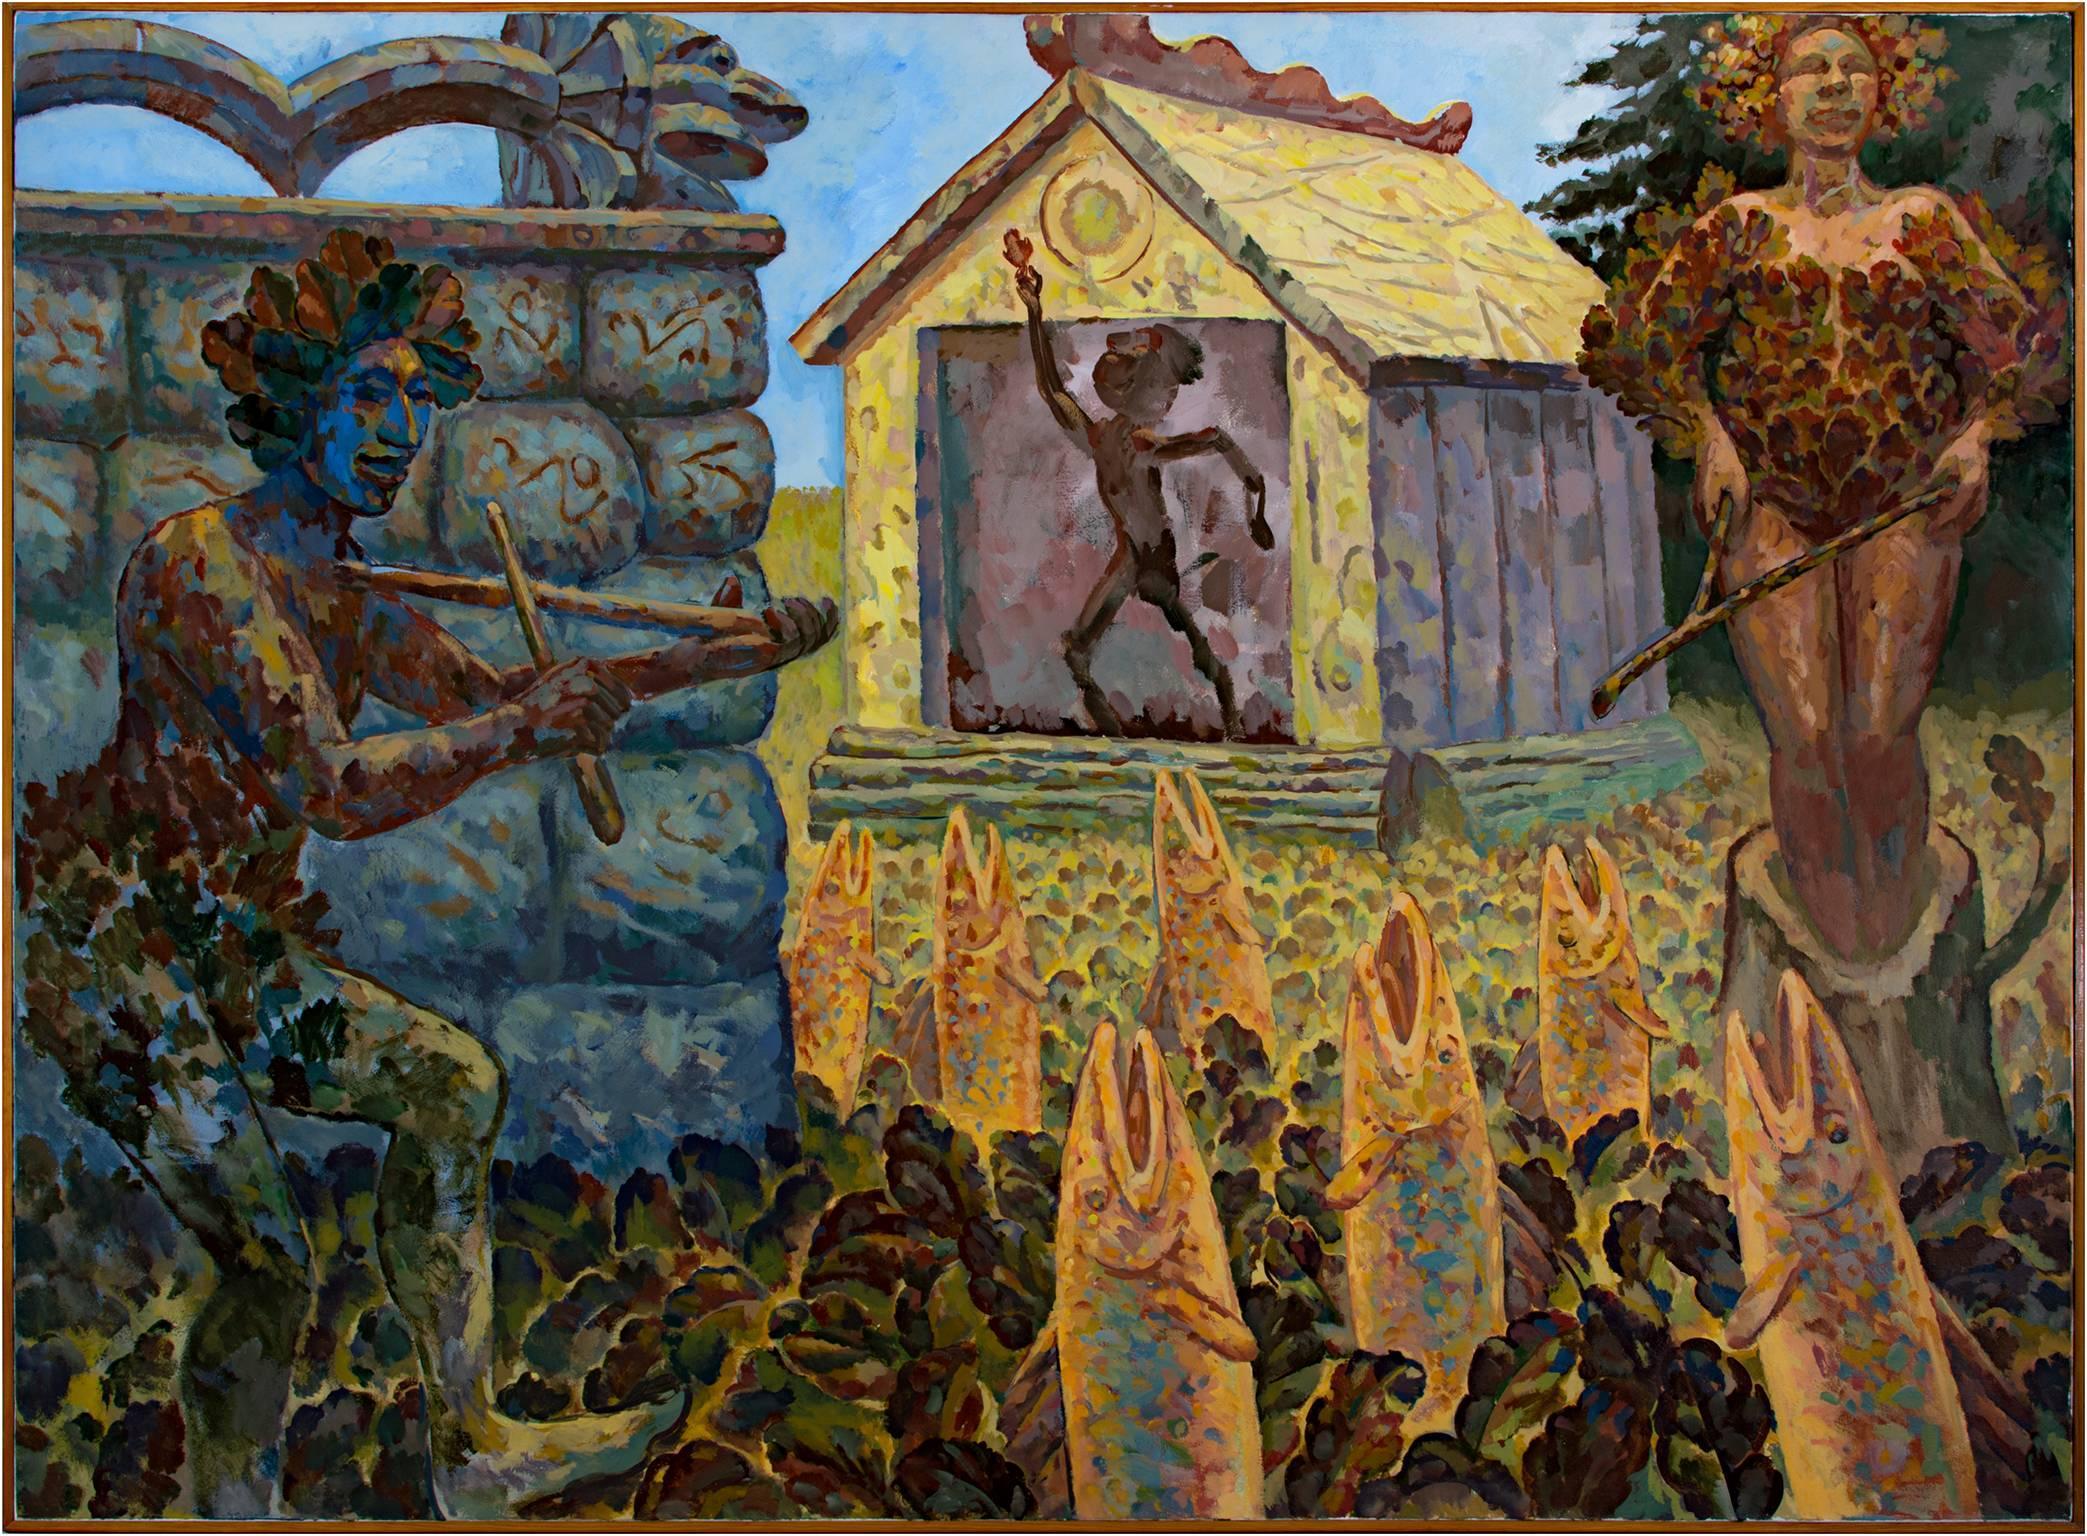 """Quercus Day at Mr. Ichthyik's House,"" Acrylic on Canvas by Randal Berndt"